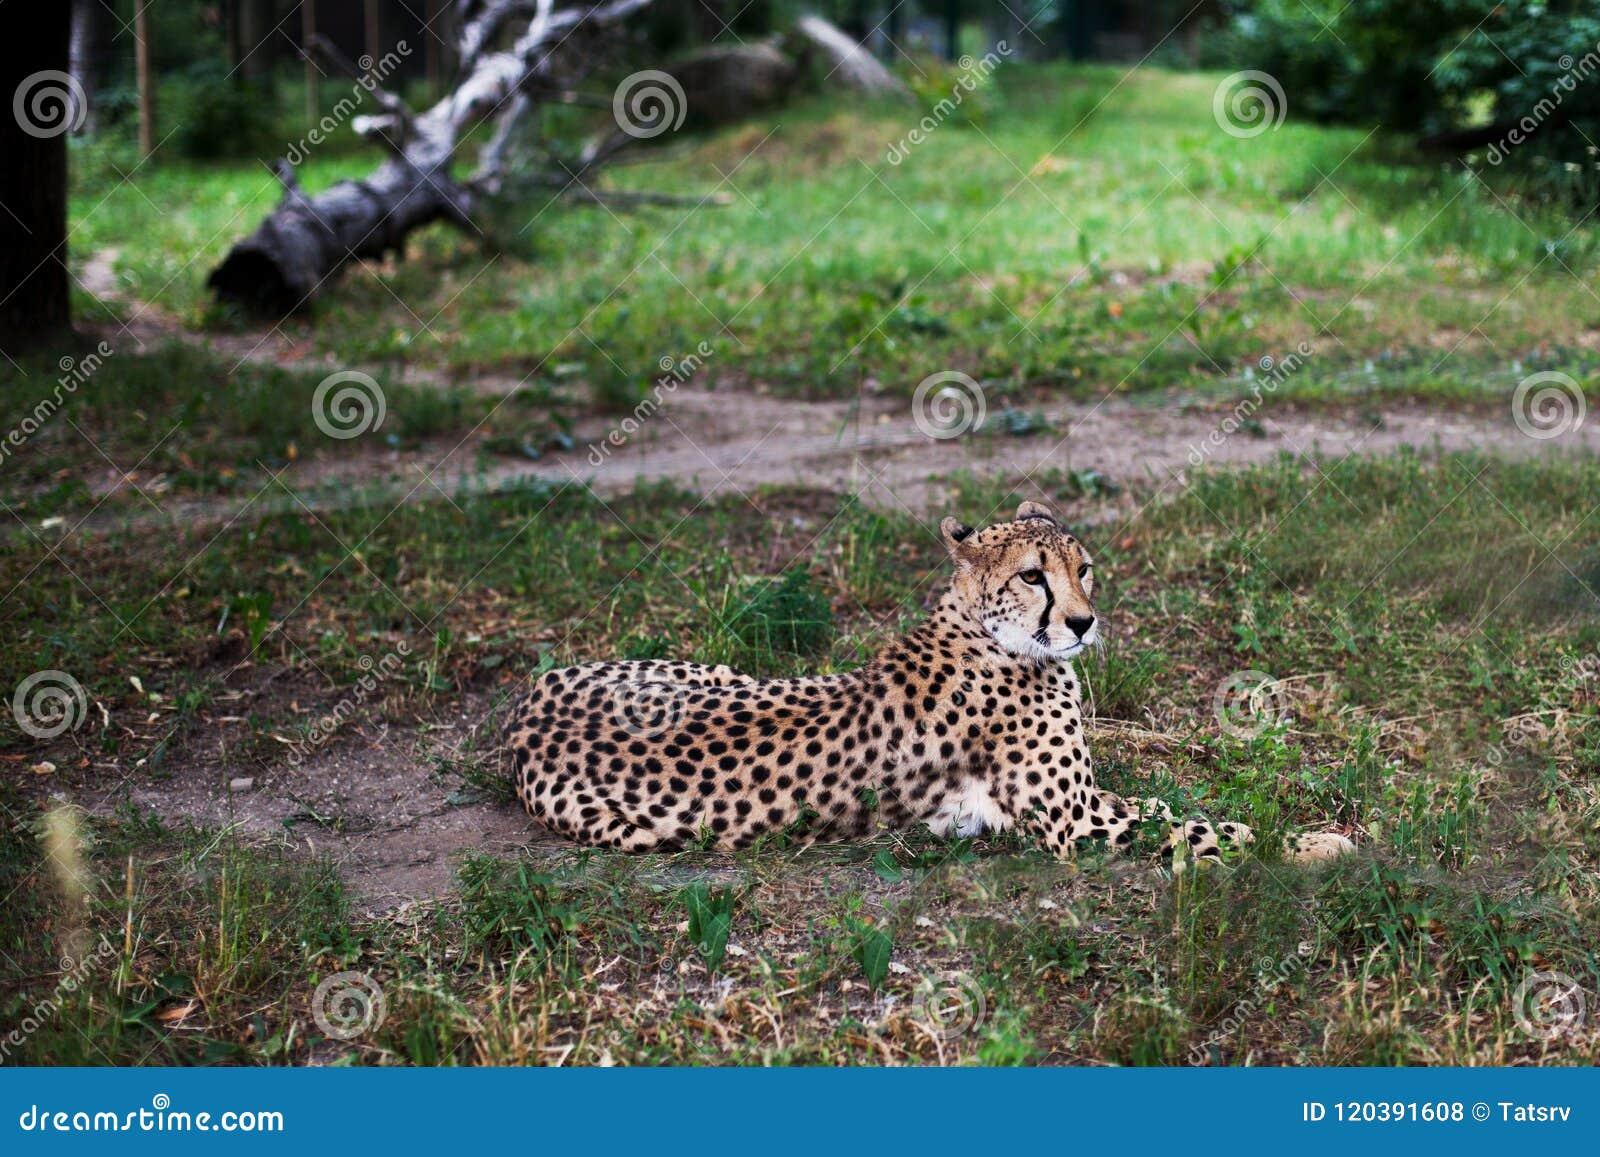 Bello ghepardo, jubatus di acinonyx riposantesi sull erba verde ed esaminante macchina fotografica primo piano vigilante di gepar